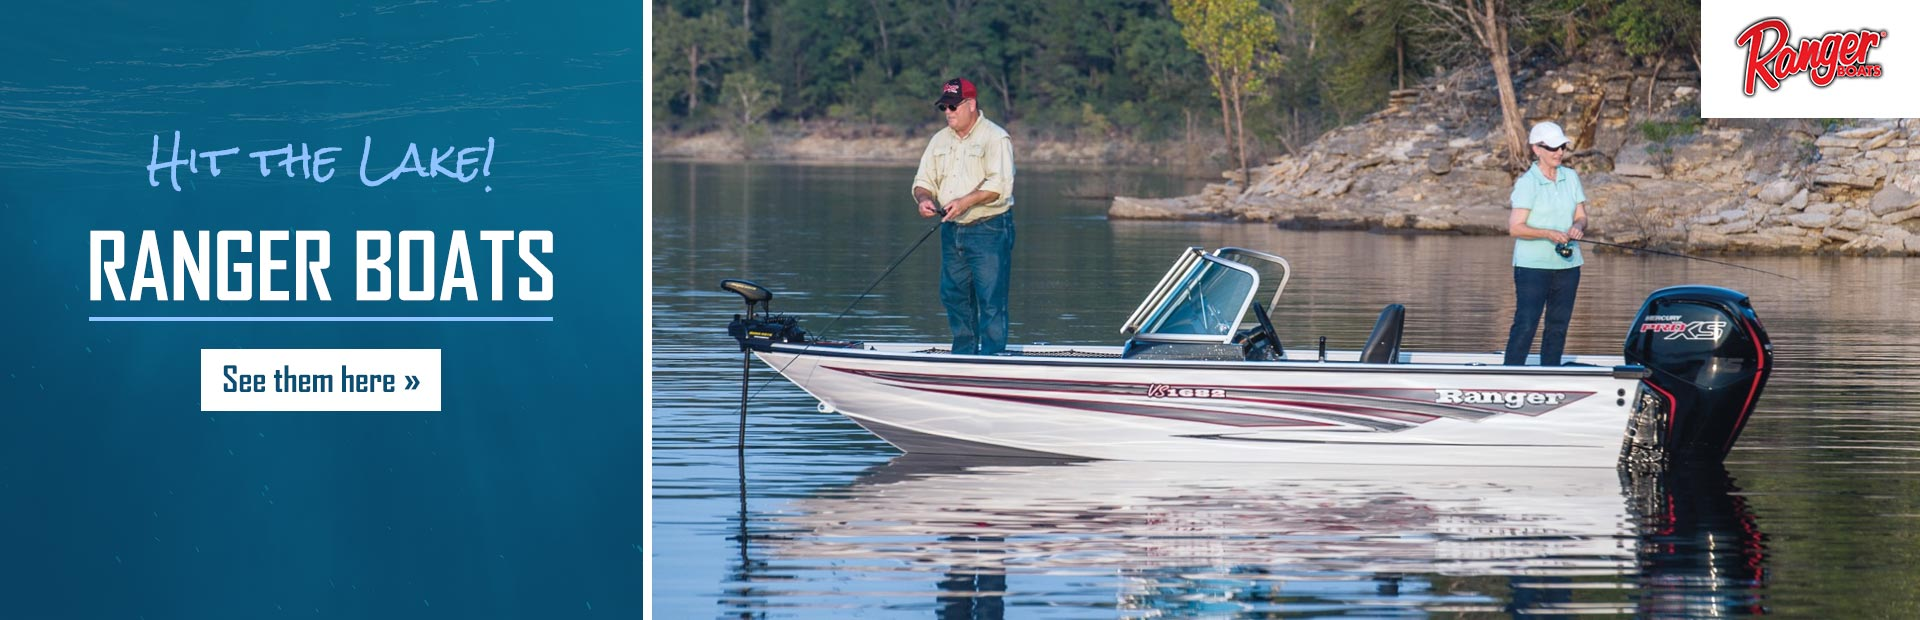 Home Sudbury Boat & Canoe Sudbury, ON (866) 676-5442